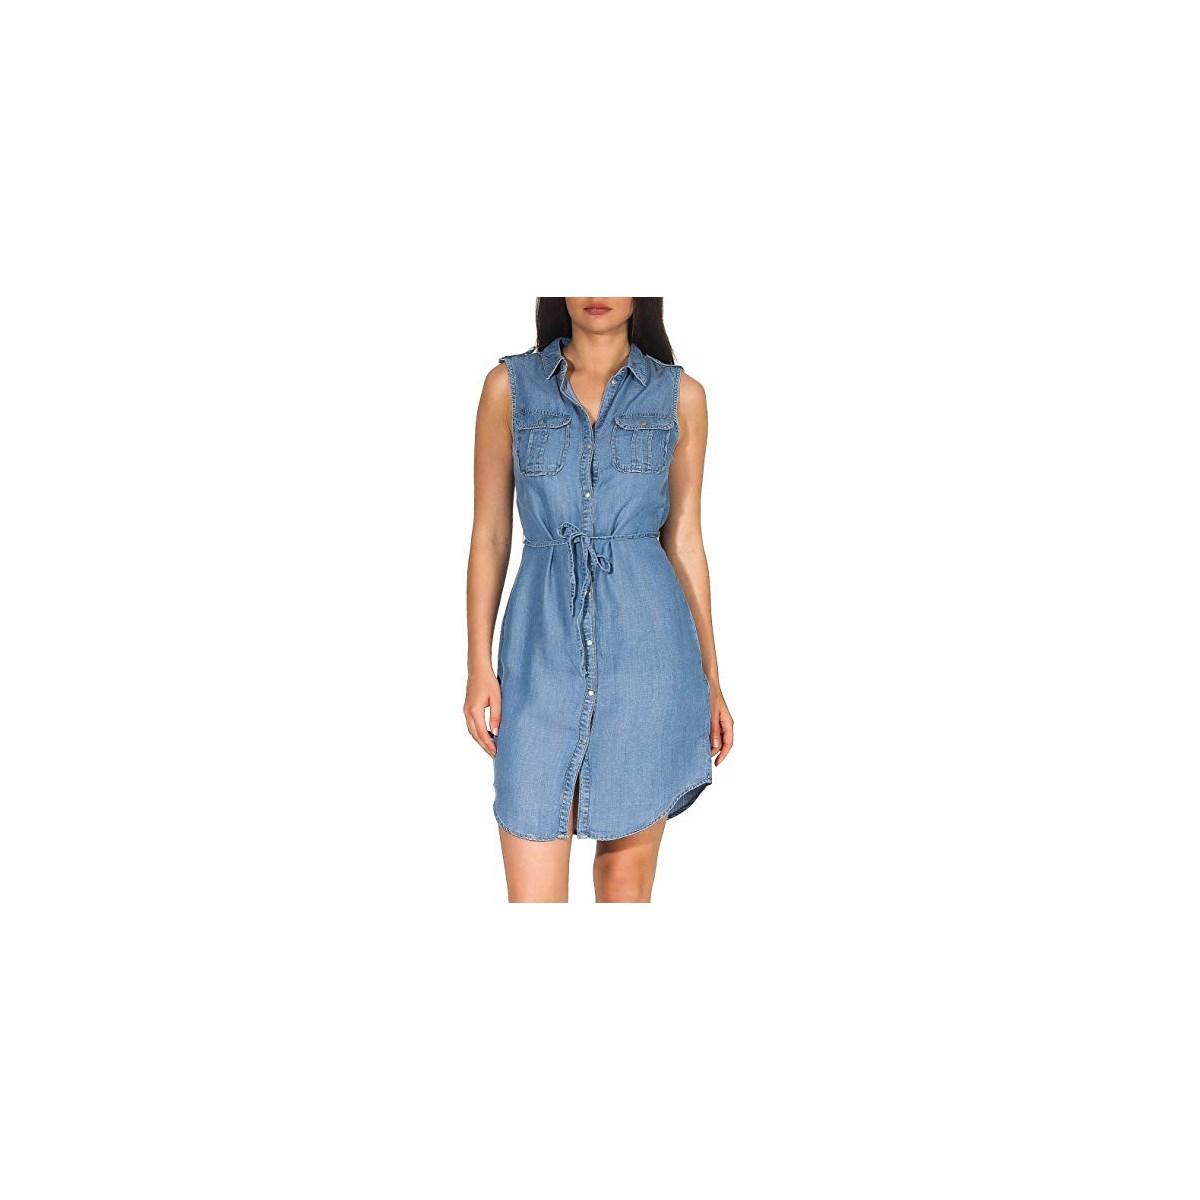 Onlnew Claire SL Shirt Dress Akm